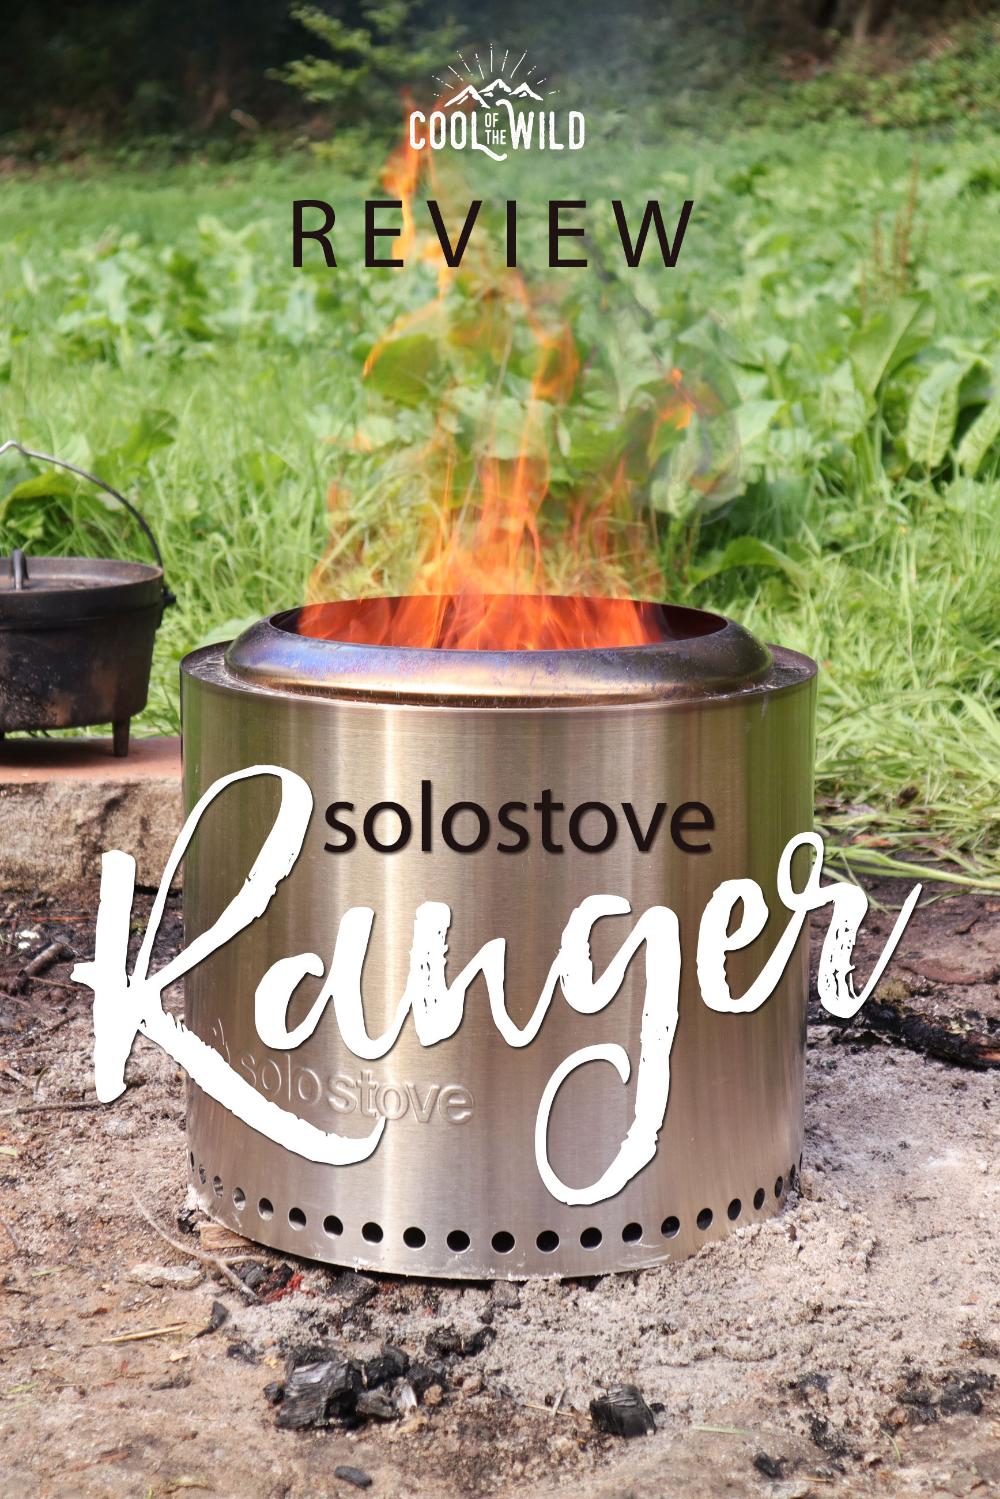 Solo Stove Bonfire Review: Chemical-free Air No Pesky Smoke - Solo Stove Ranger Fire Pit